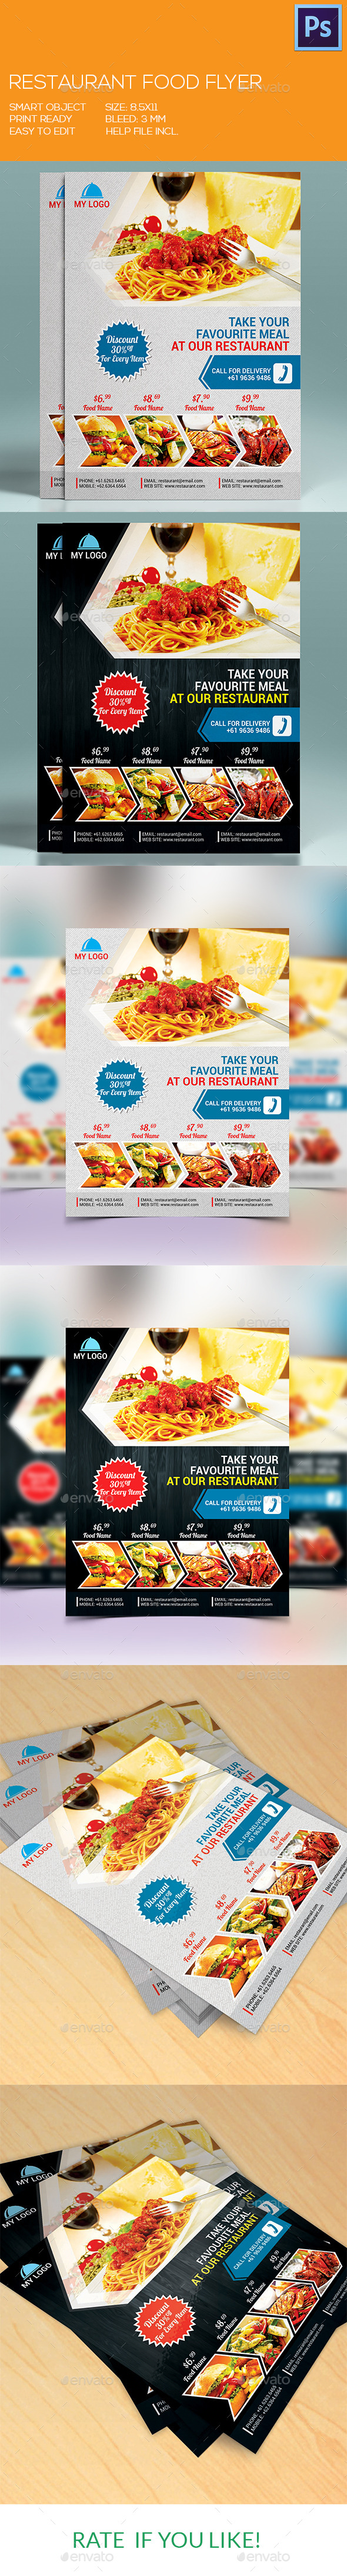 Restaurant/Fast Food Flyer - Restaurant Flyers